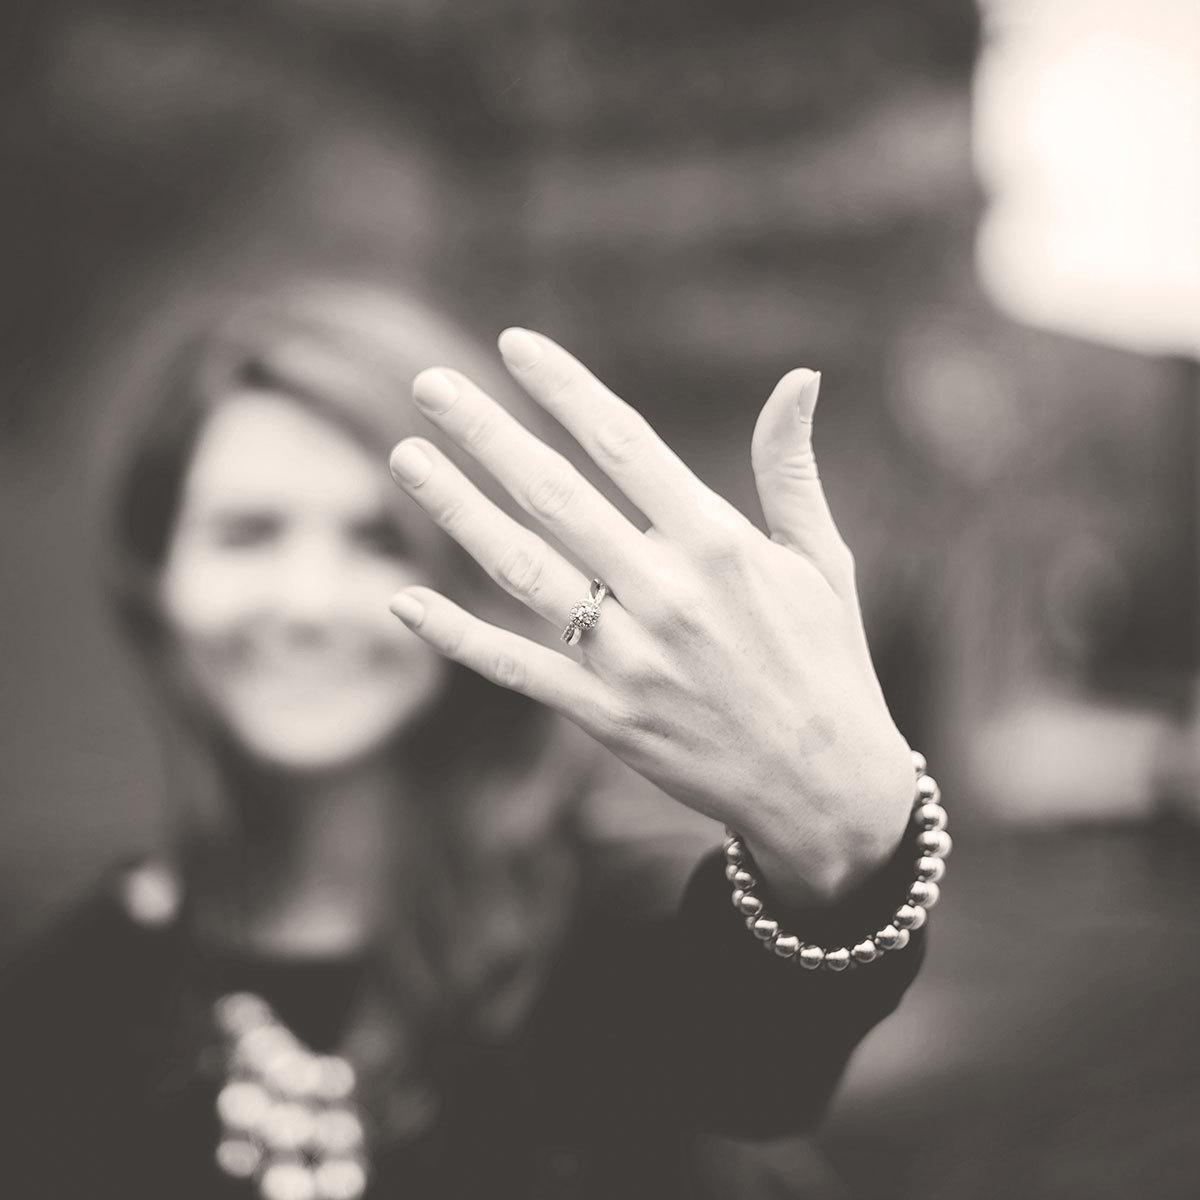 fiance-engagement-ring